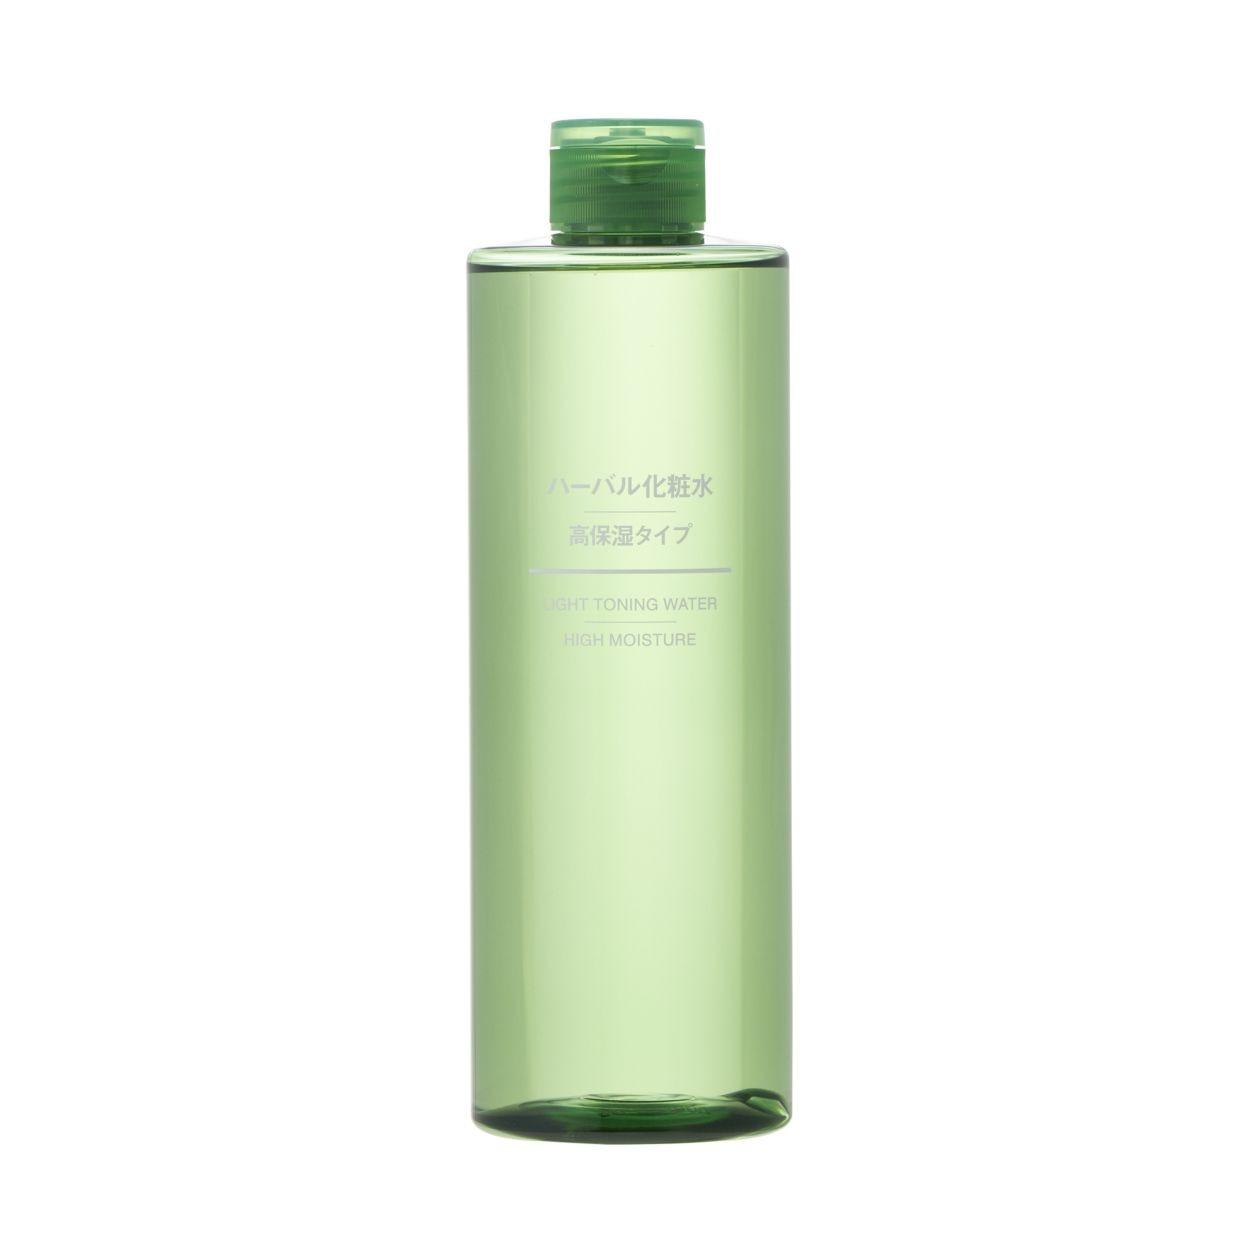 MUJI草本化妝水(保濕型) 400ml | 無印良品